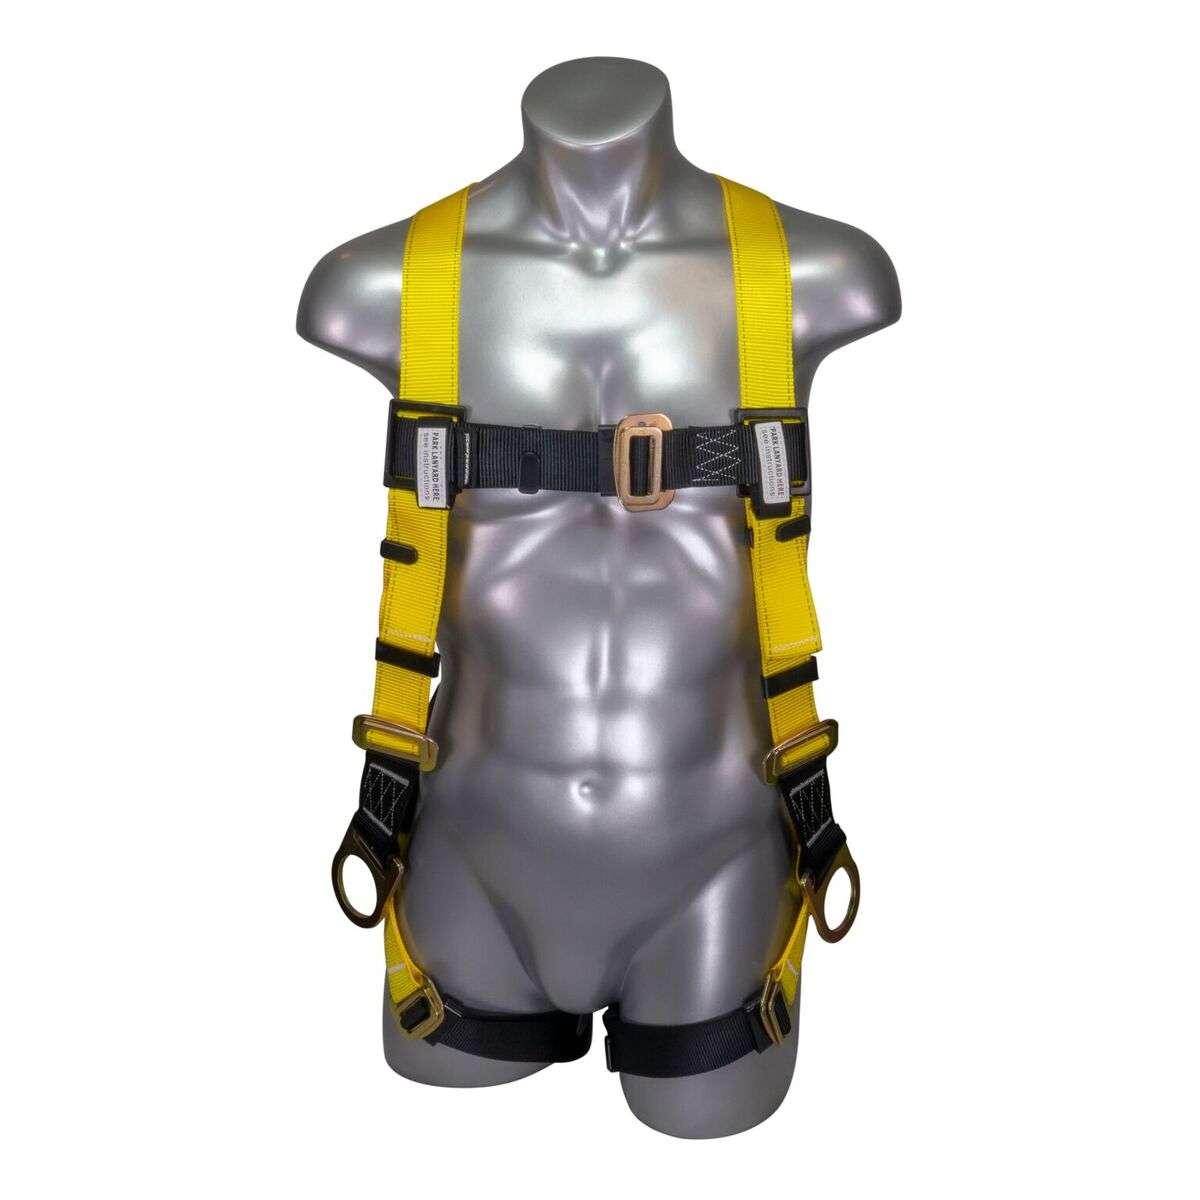 fullbodyharnesssidedrings full body harness 3 d rings (dorsal & side) 5 point adjustability